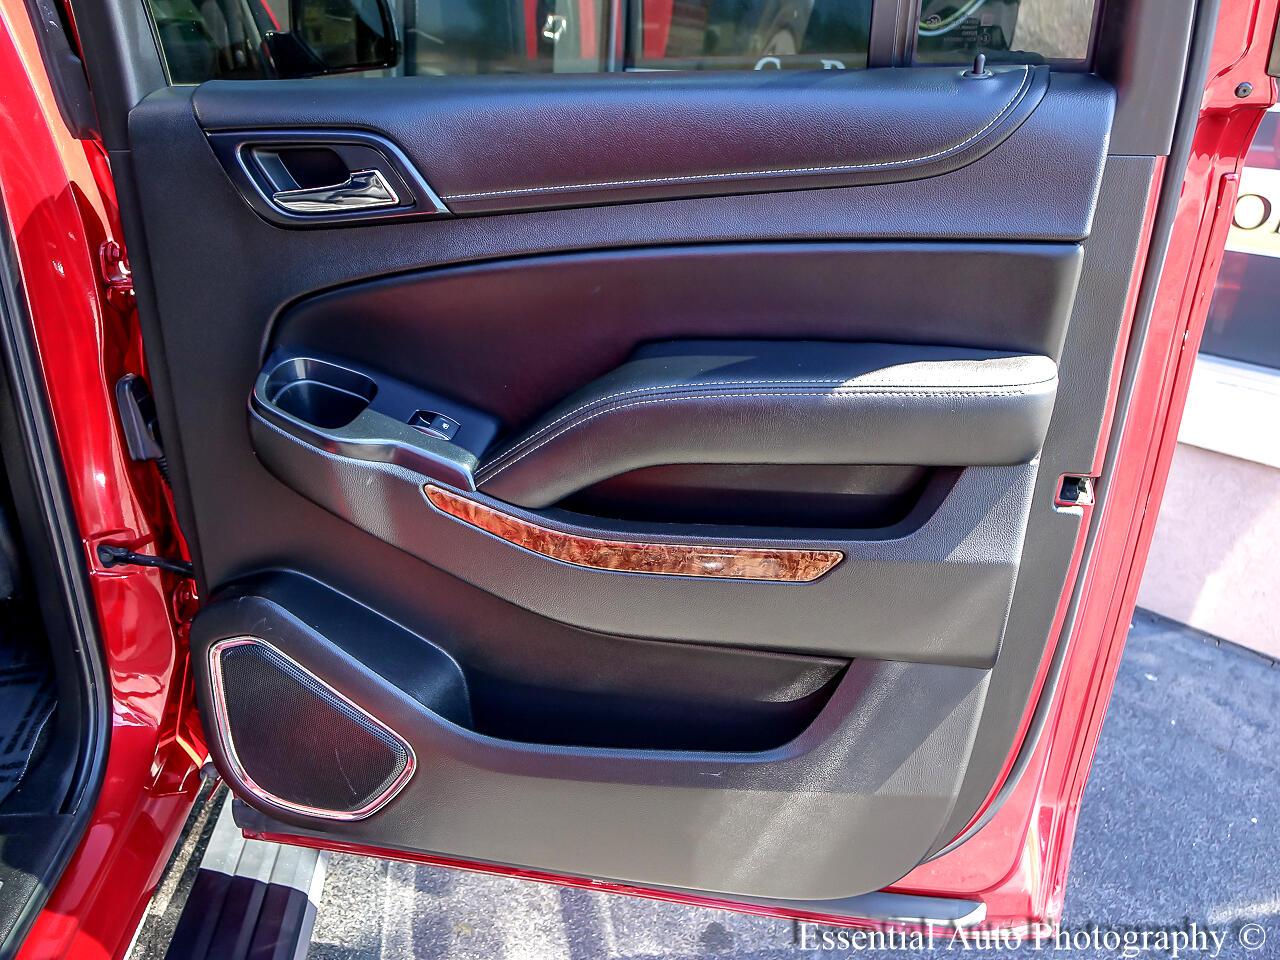 Chevrolet Suburban LTZ 1500 4WD 2015